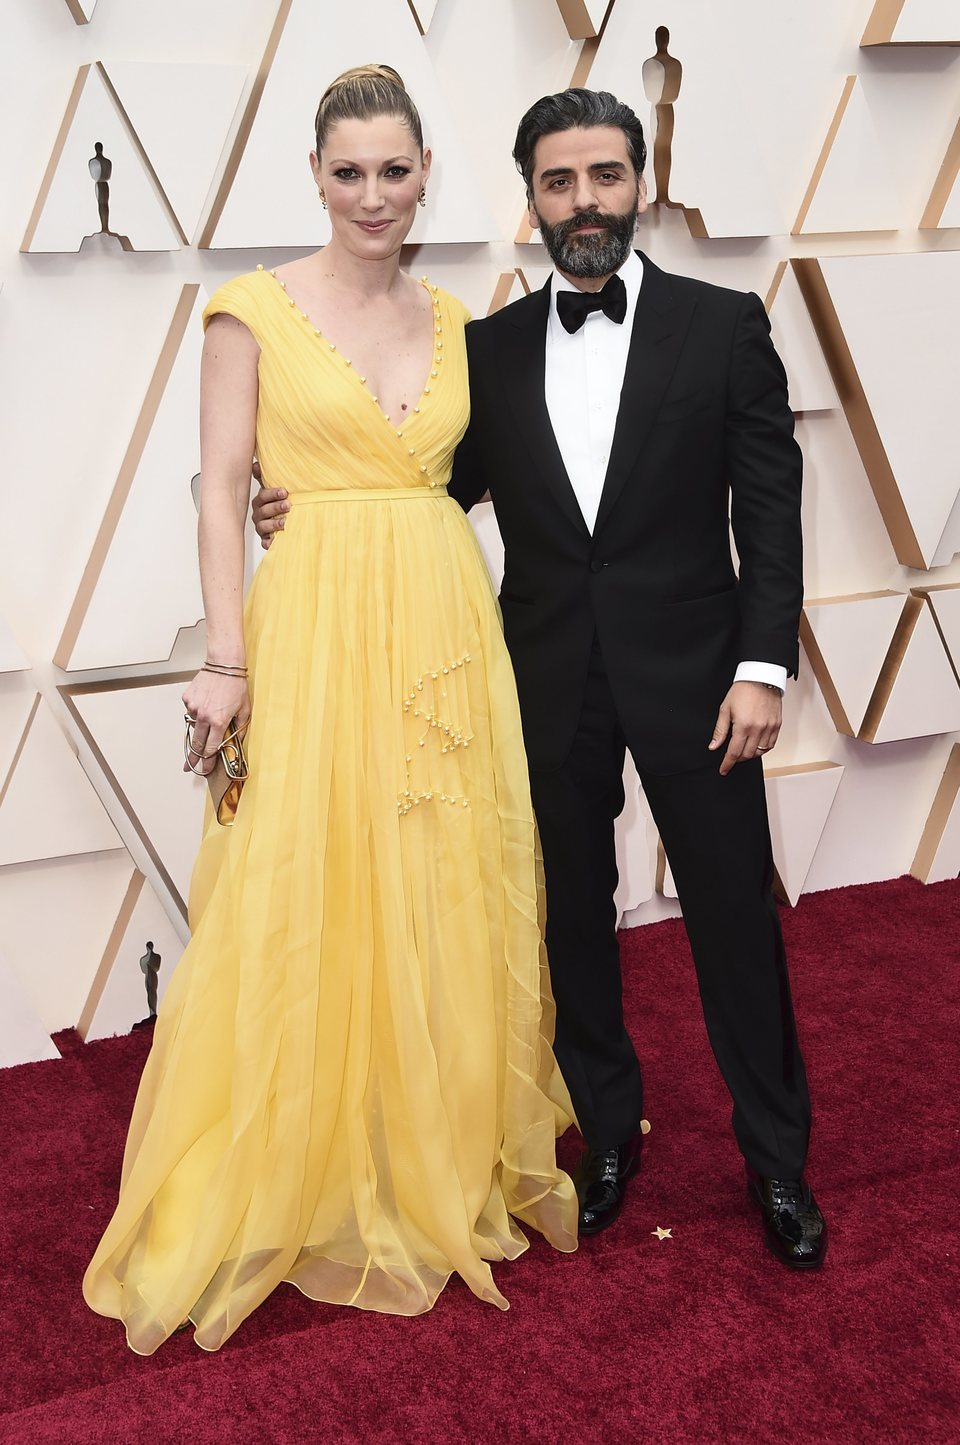 Oscar Isaac on the red carpet at the 2020 Oscar Awards